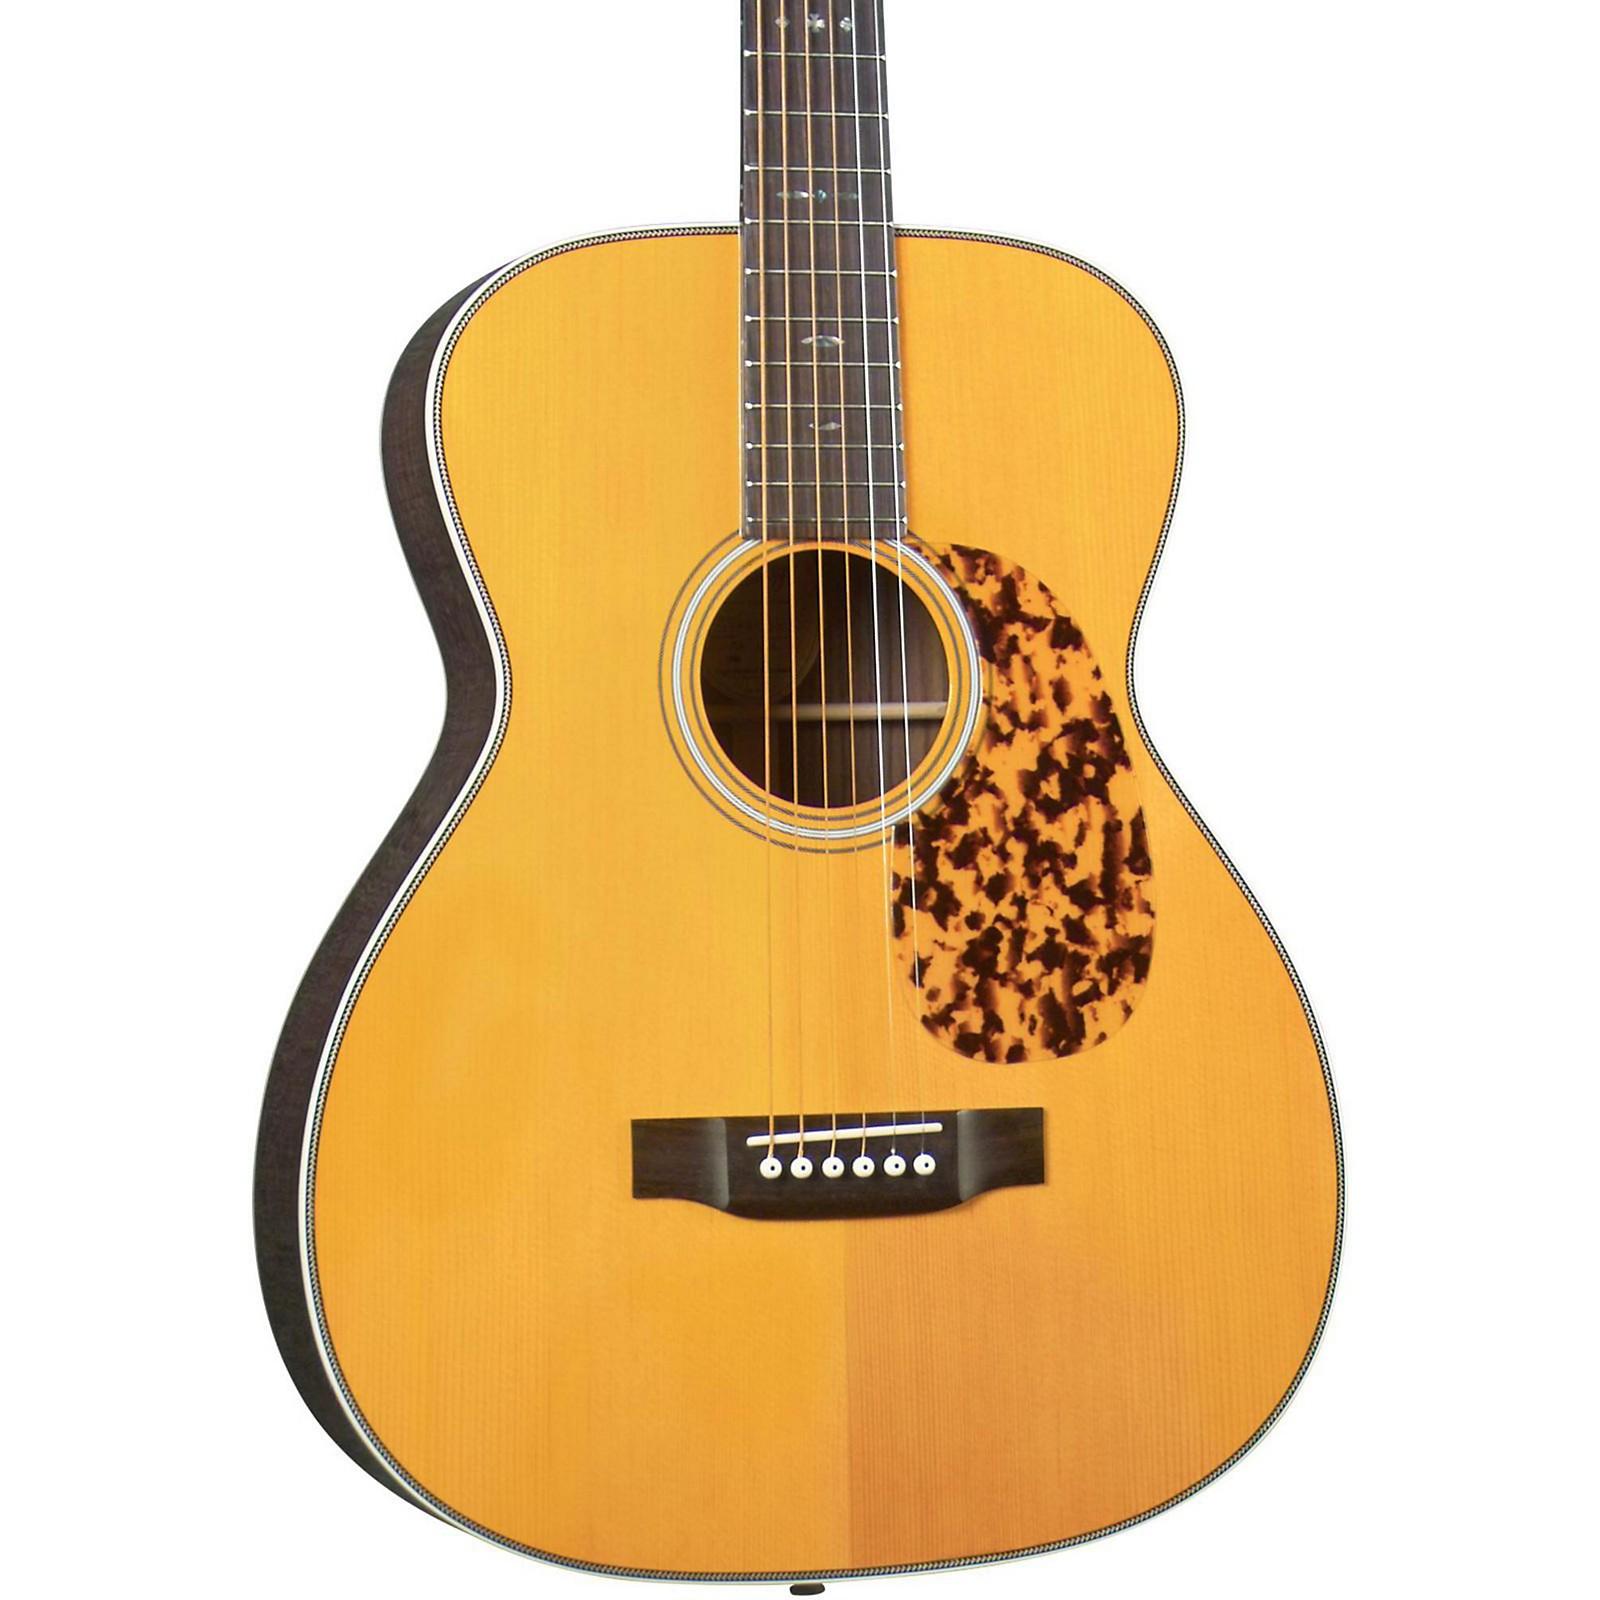 Blueridge Historic Series BR-162 000 Acoustic Guitar